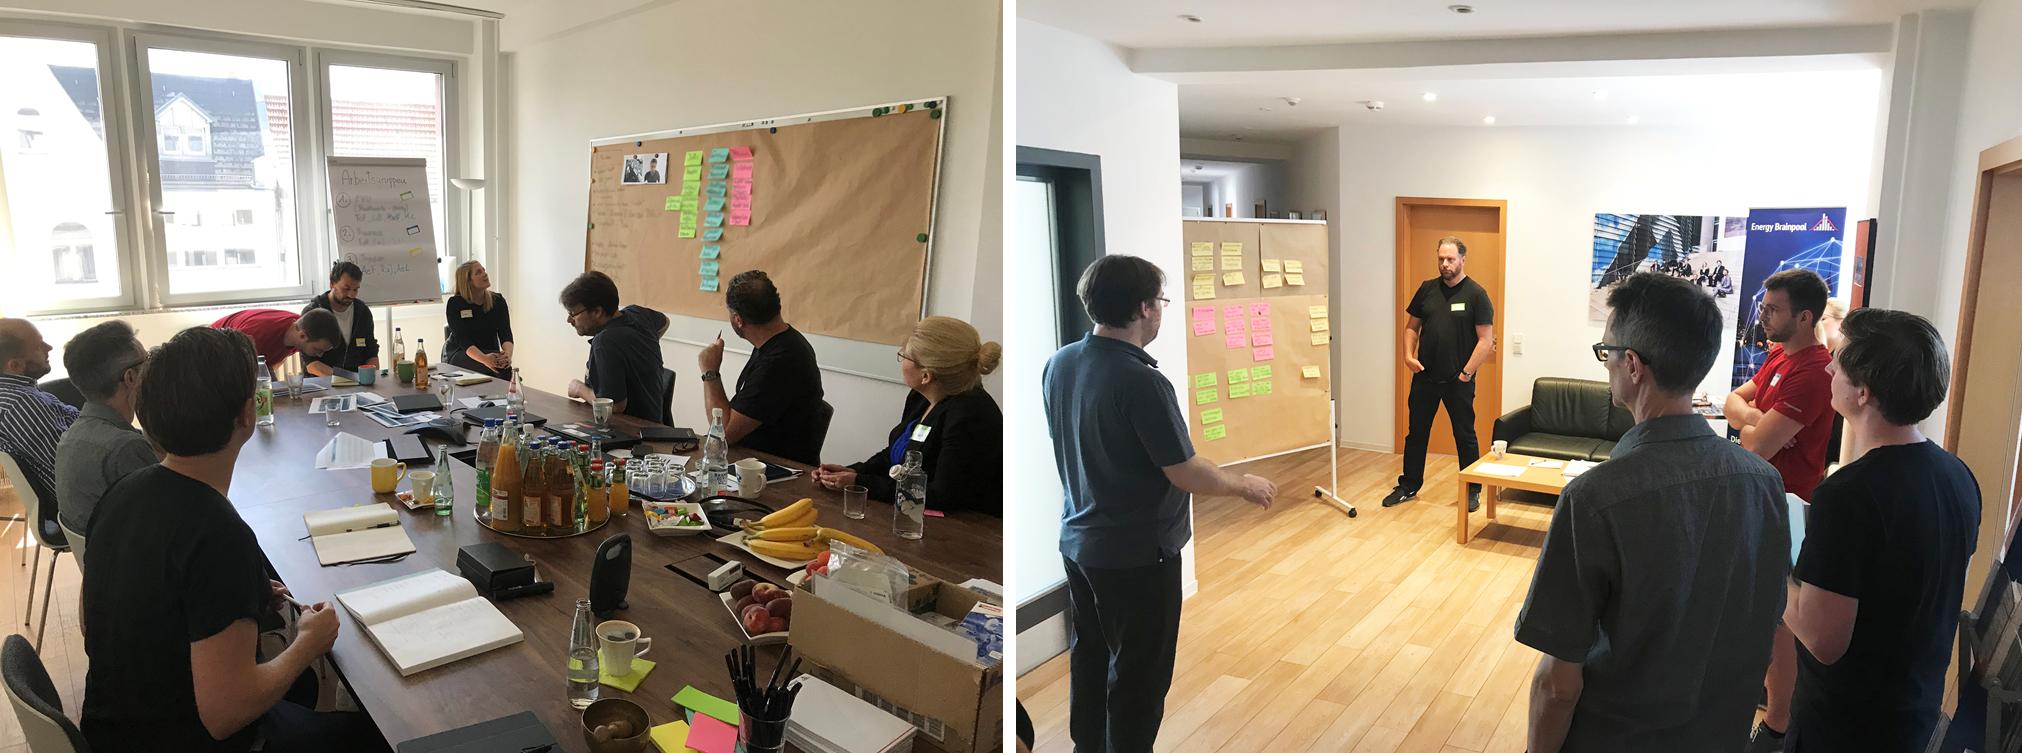 Fig. 5: Workshop at Energy Brainpool